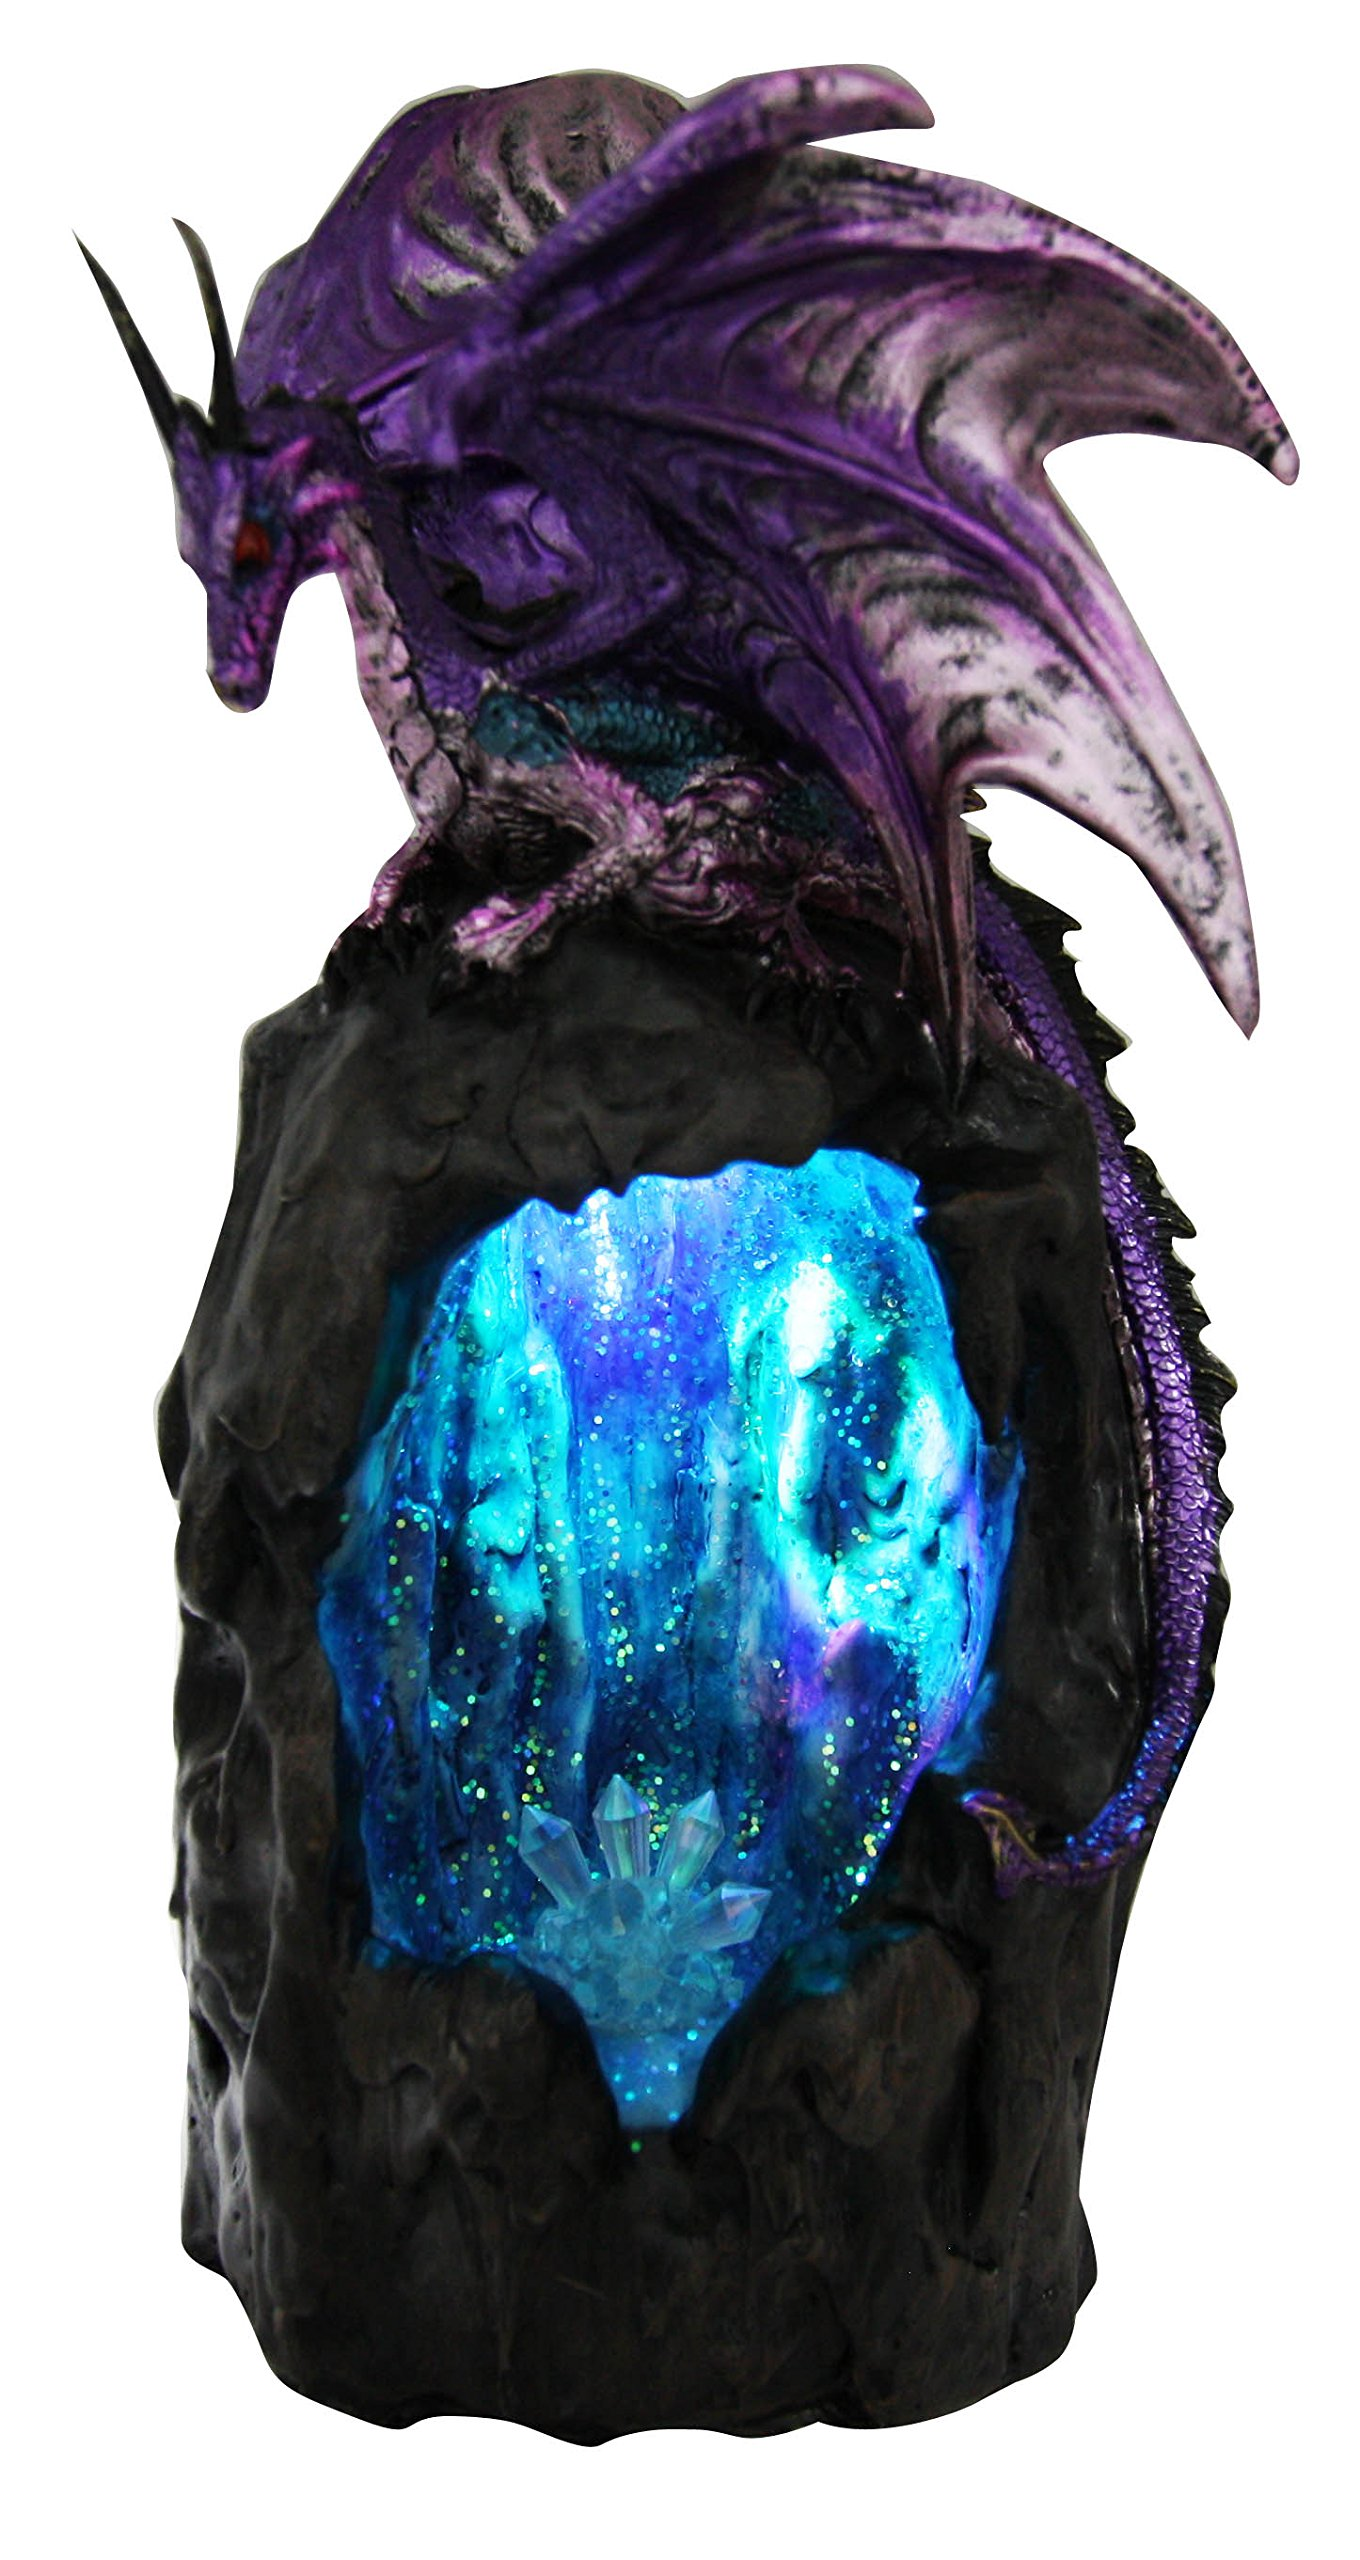 Ebros Purple Azurite Quartz Dragon Climbing On Gemstone Mountain Backflow Incense Burner Figurine Faux Stone by Ebros Gift (Image #3)